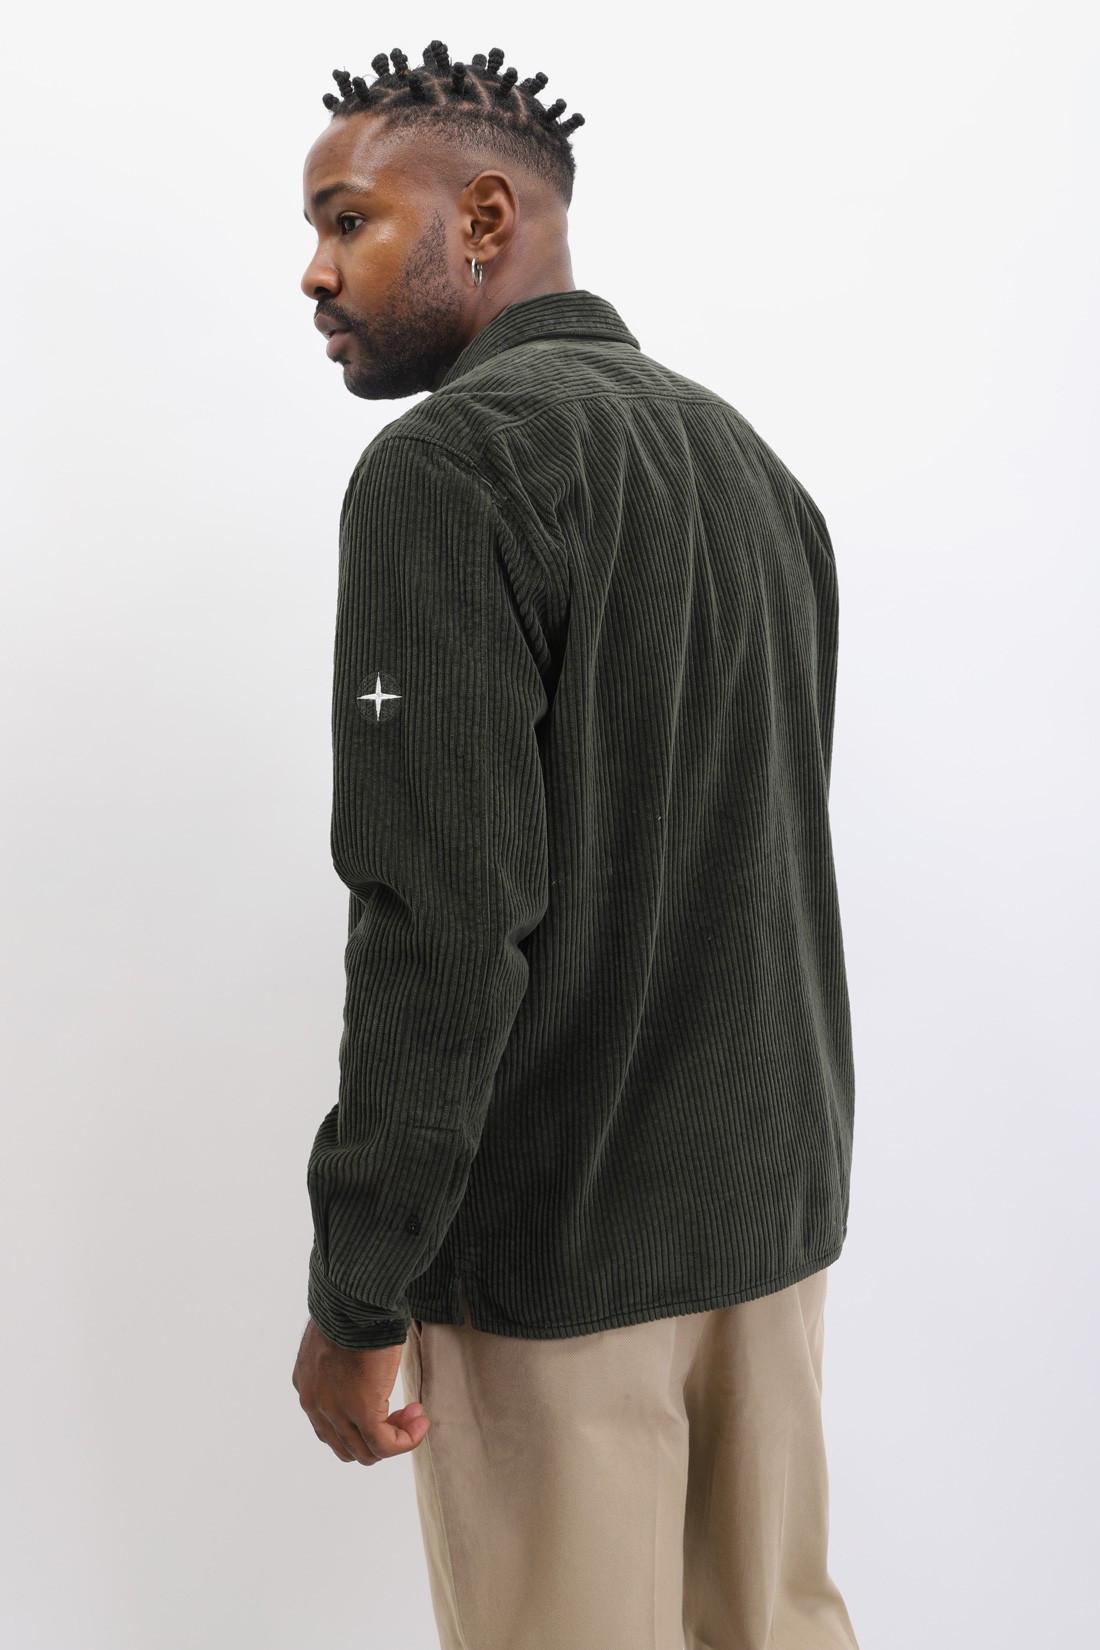 STONE ISLAND / 12111 corduroy shirt v0059 Muschio